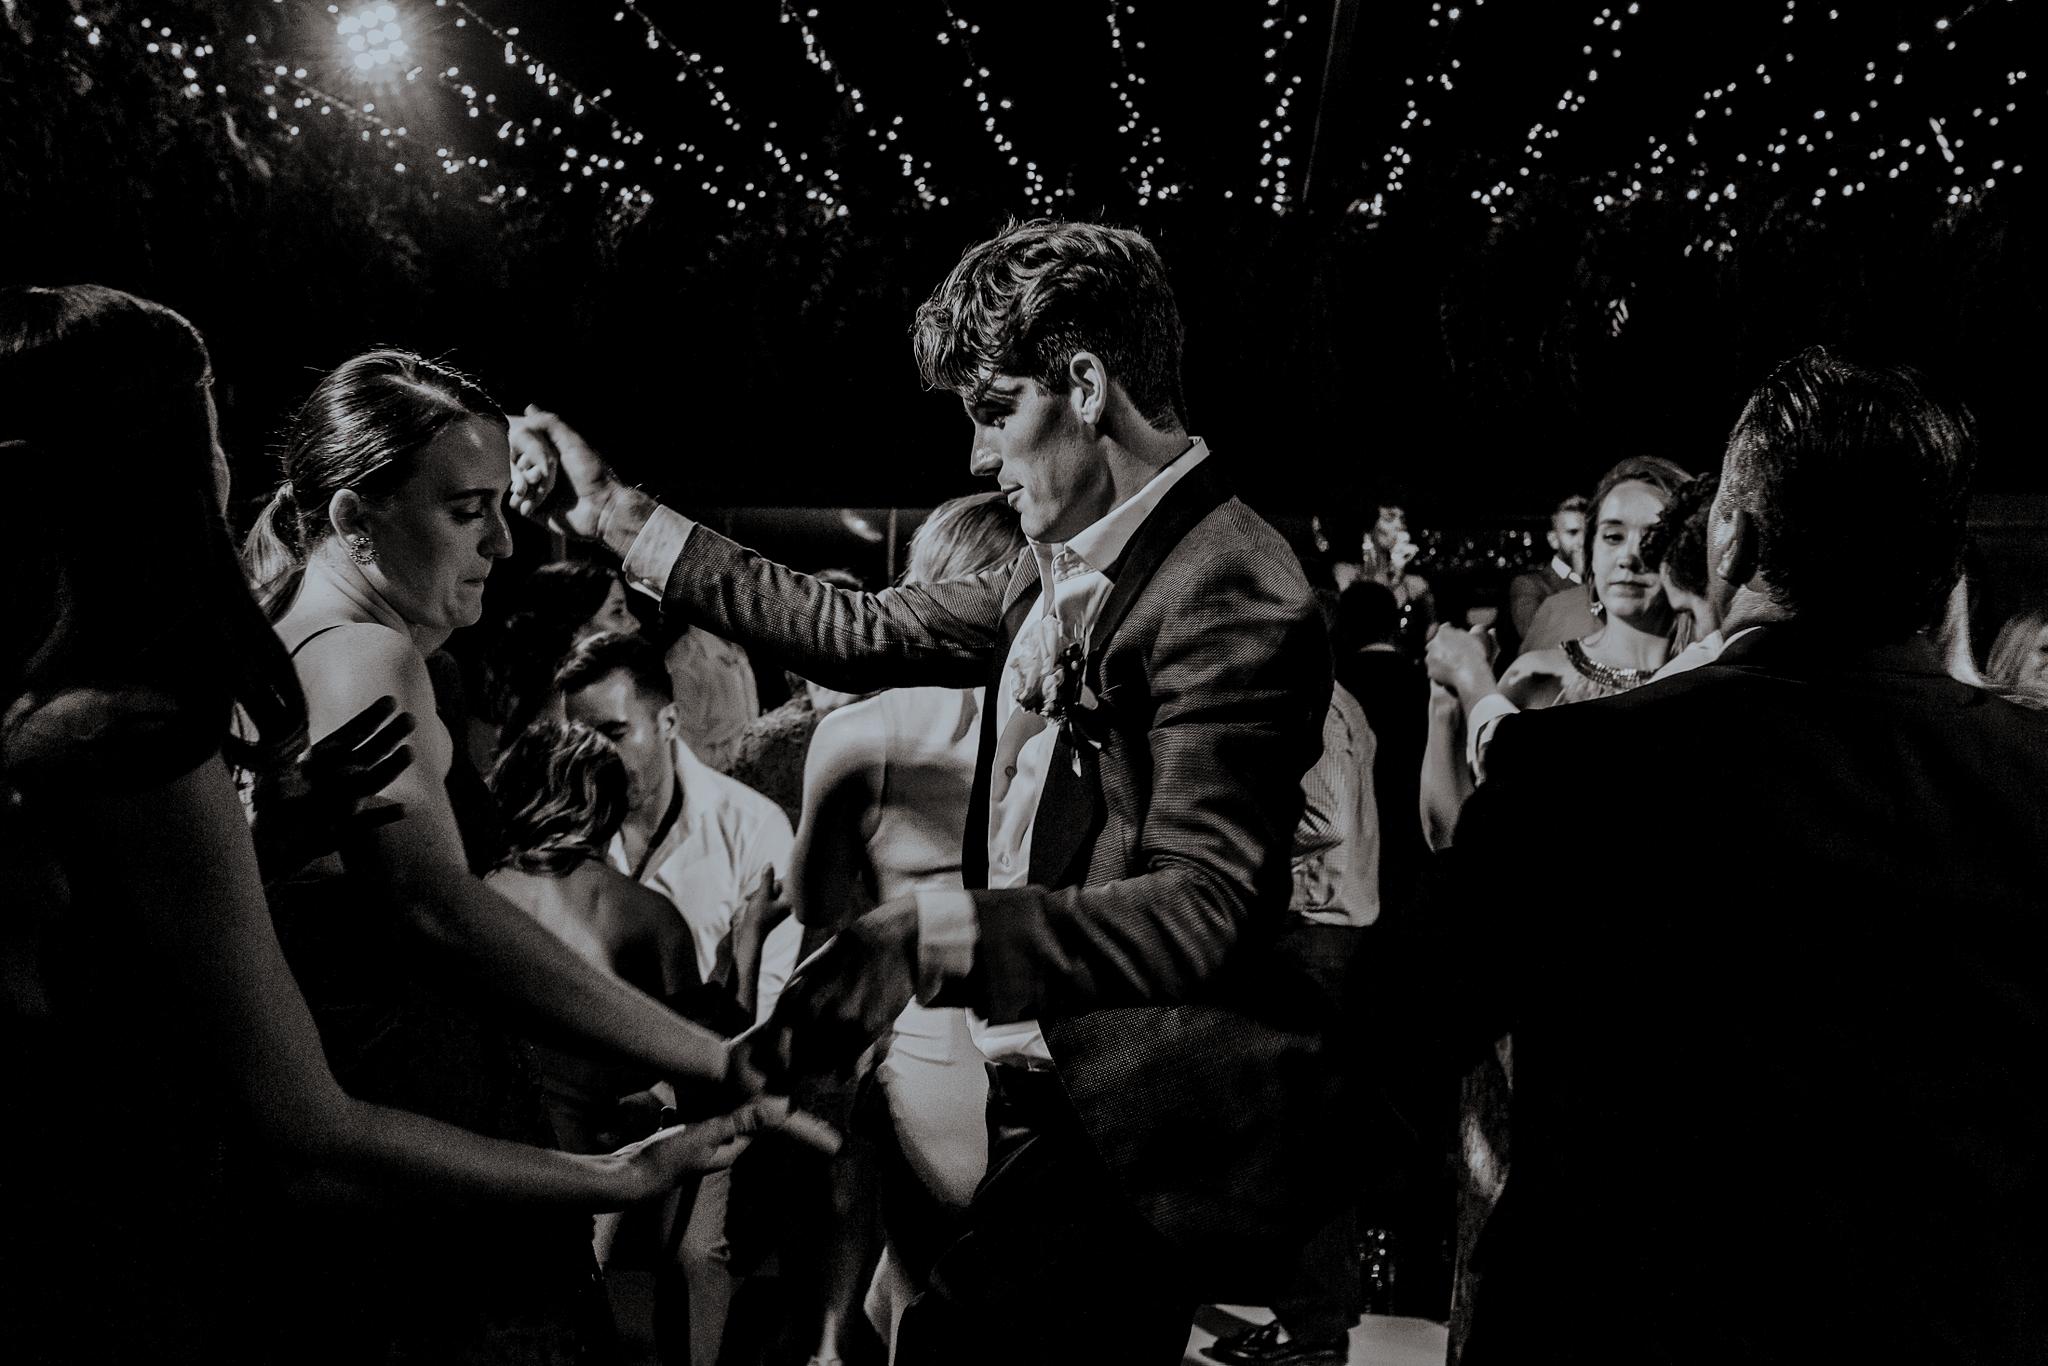 destination-austin-wedding-photographer-italy-florence567.JPG